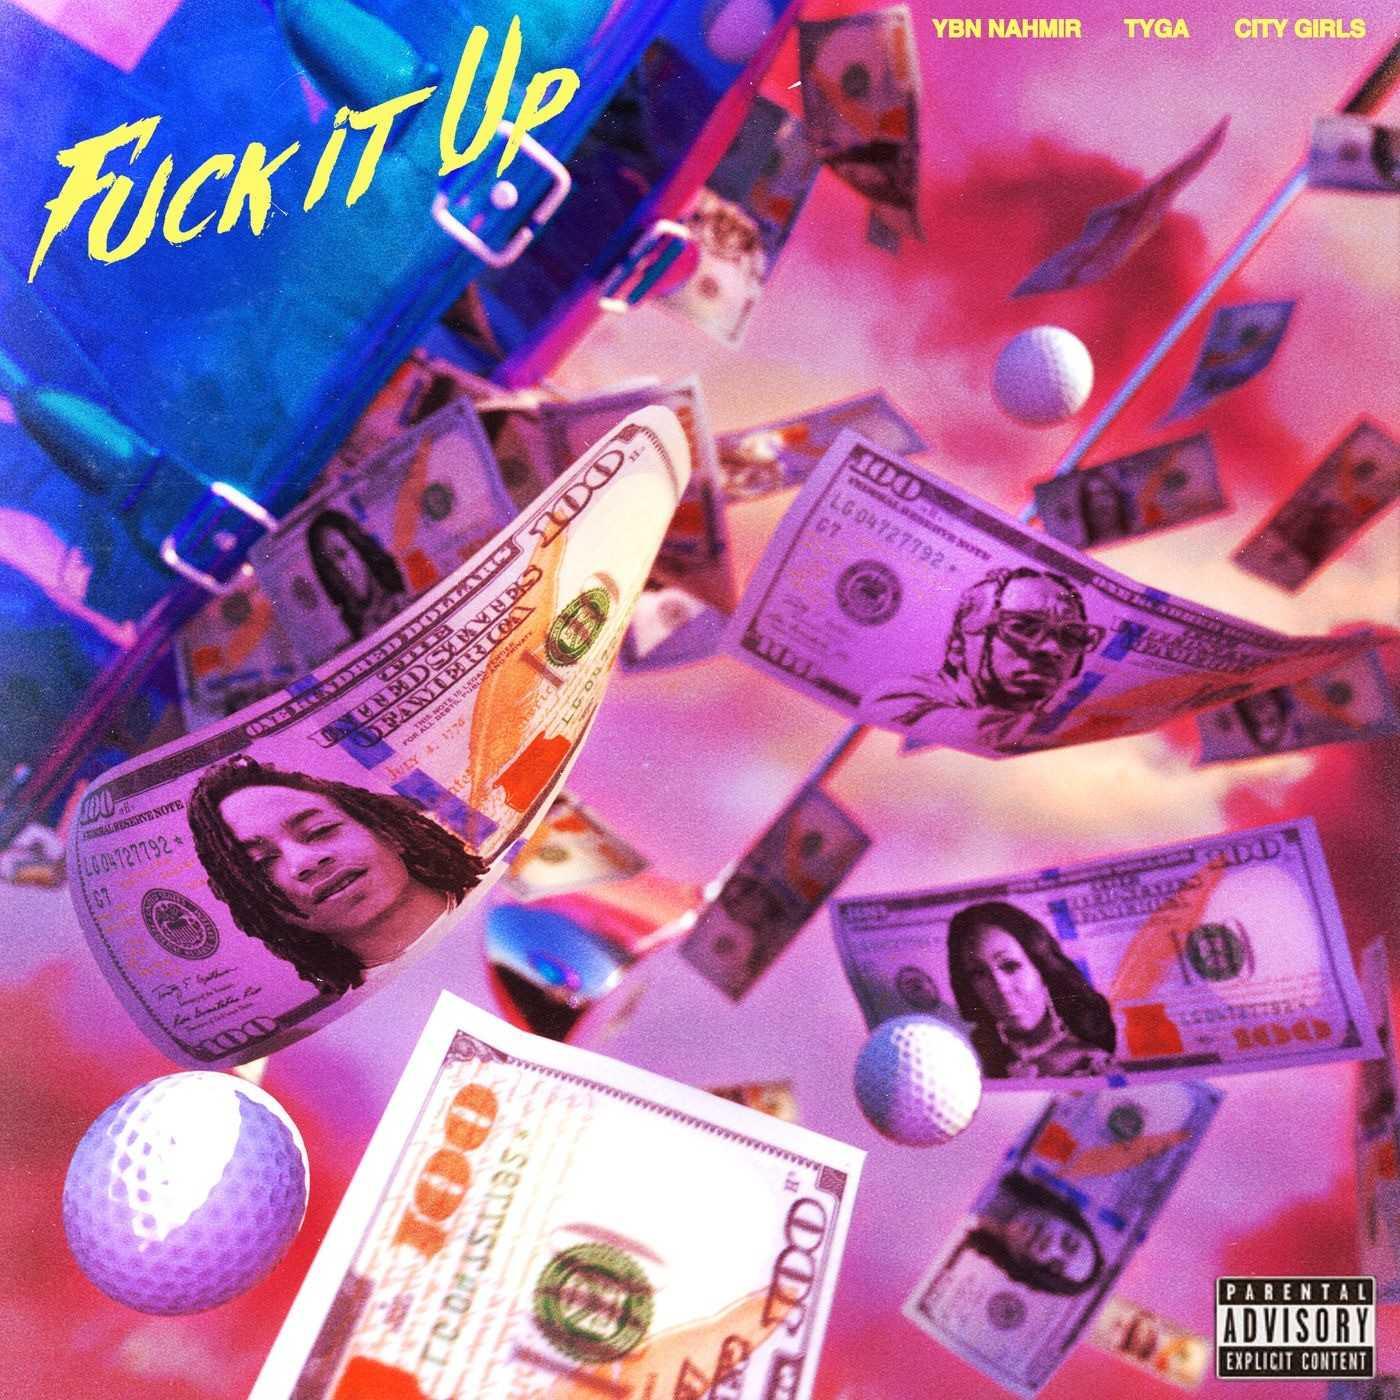 New Single: YBN Nahmir – F**k It Up (feat. City Girls & Tyga) [Audio]